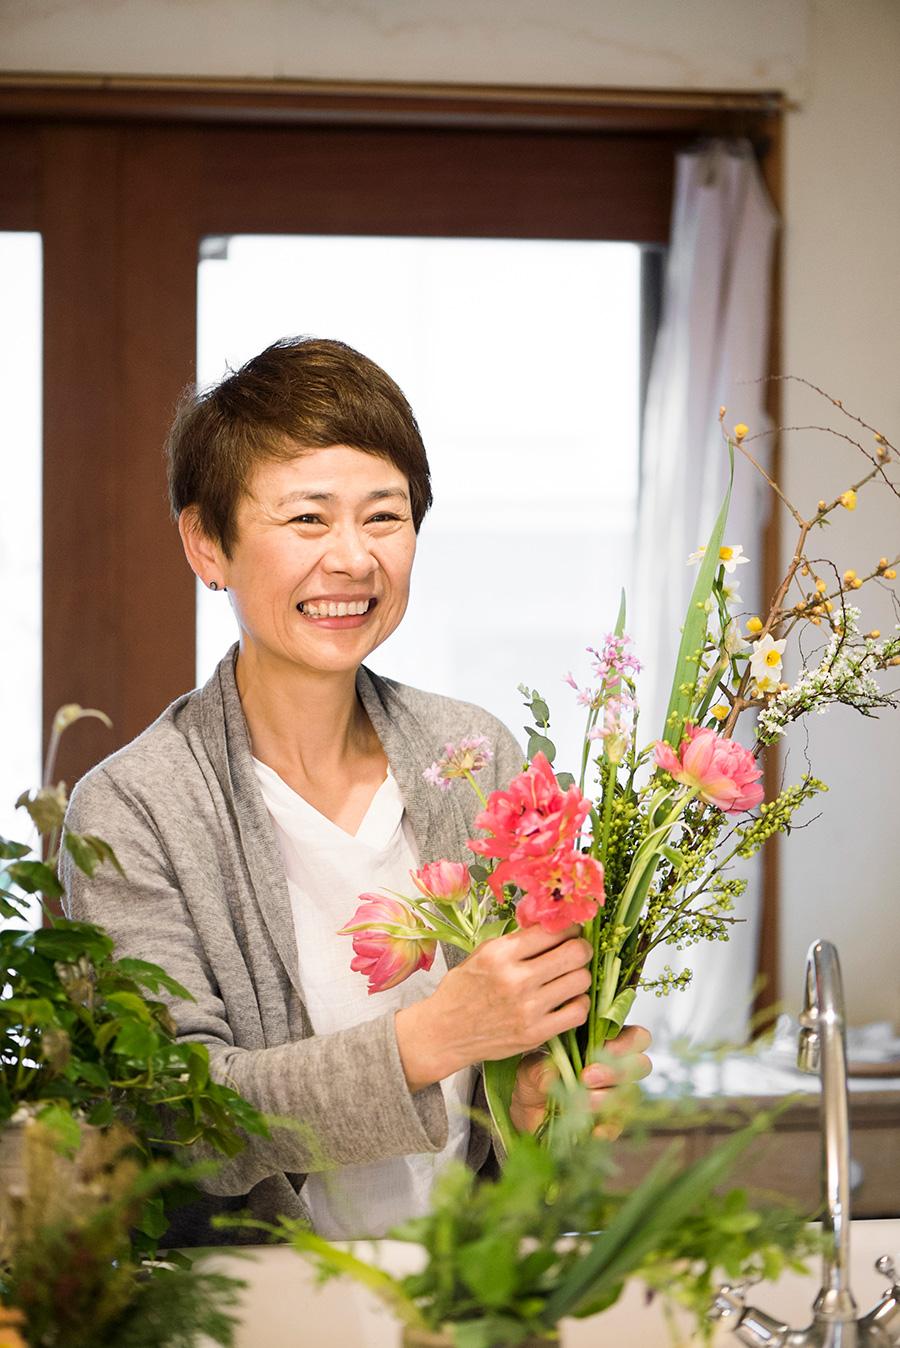 「Bouquet de soleil」として活動する花手・プランツスタイリストの井出綾さん。自然と暮らしをつなぐ花をテーマに、身近な植物を通して季節の楽しみ方を提案。